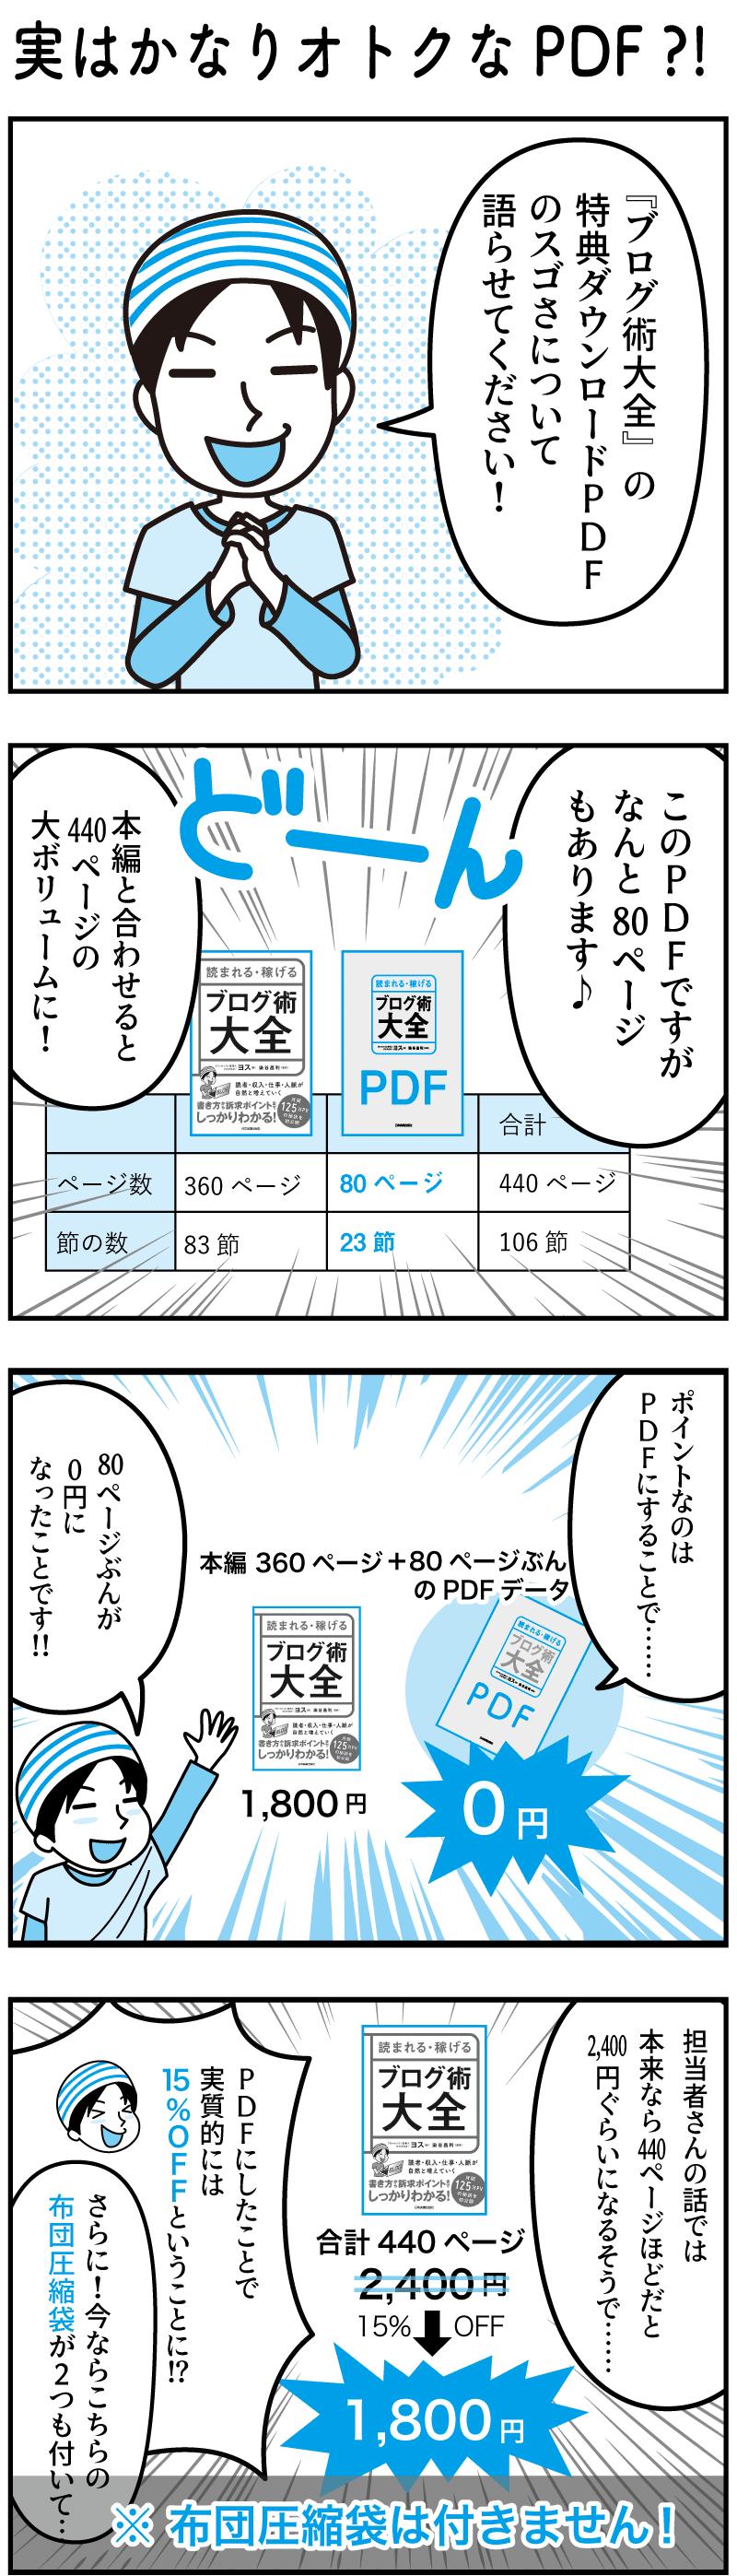 PDFのマンガ